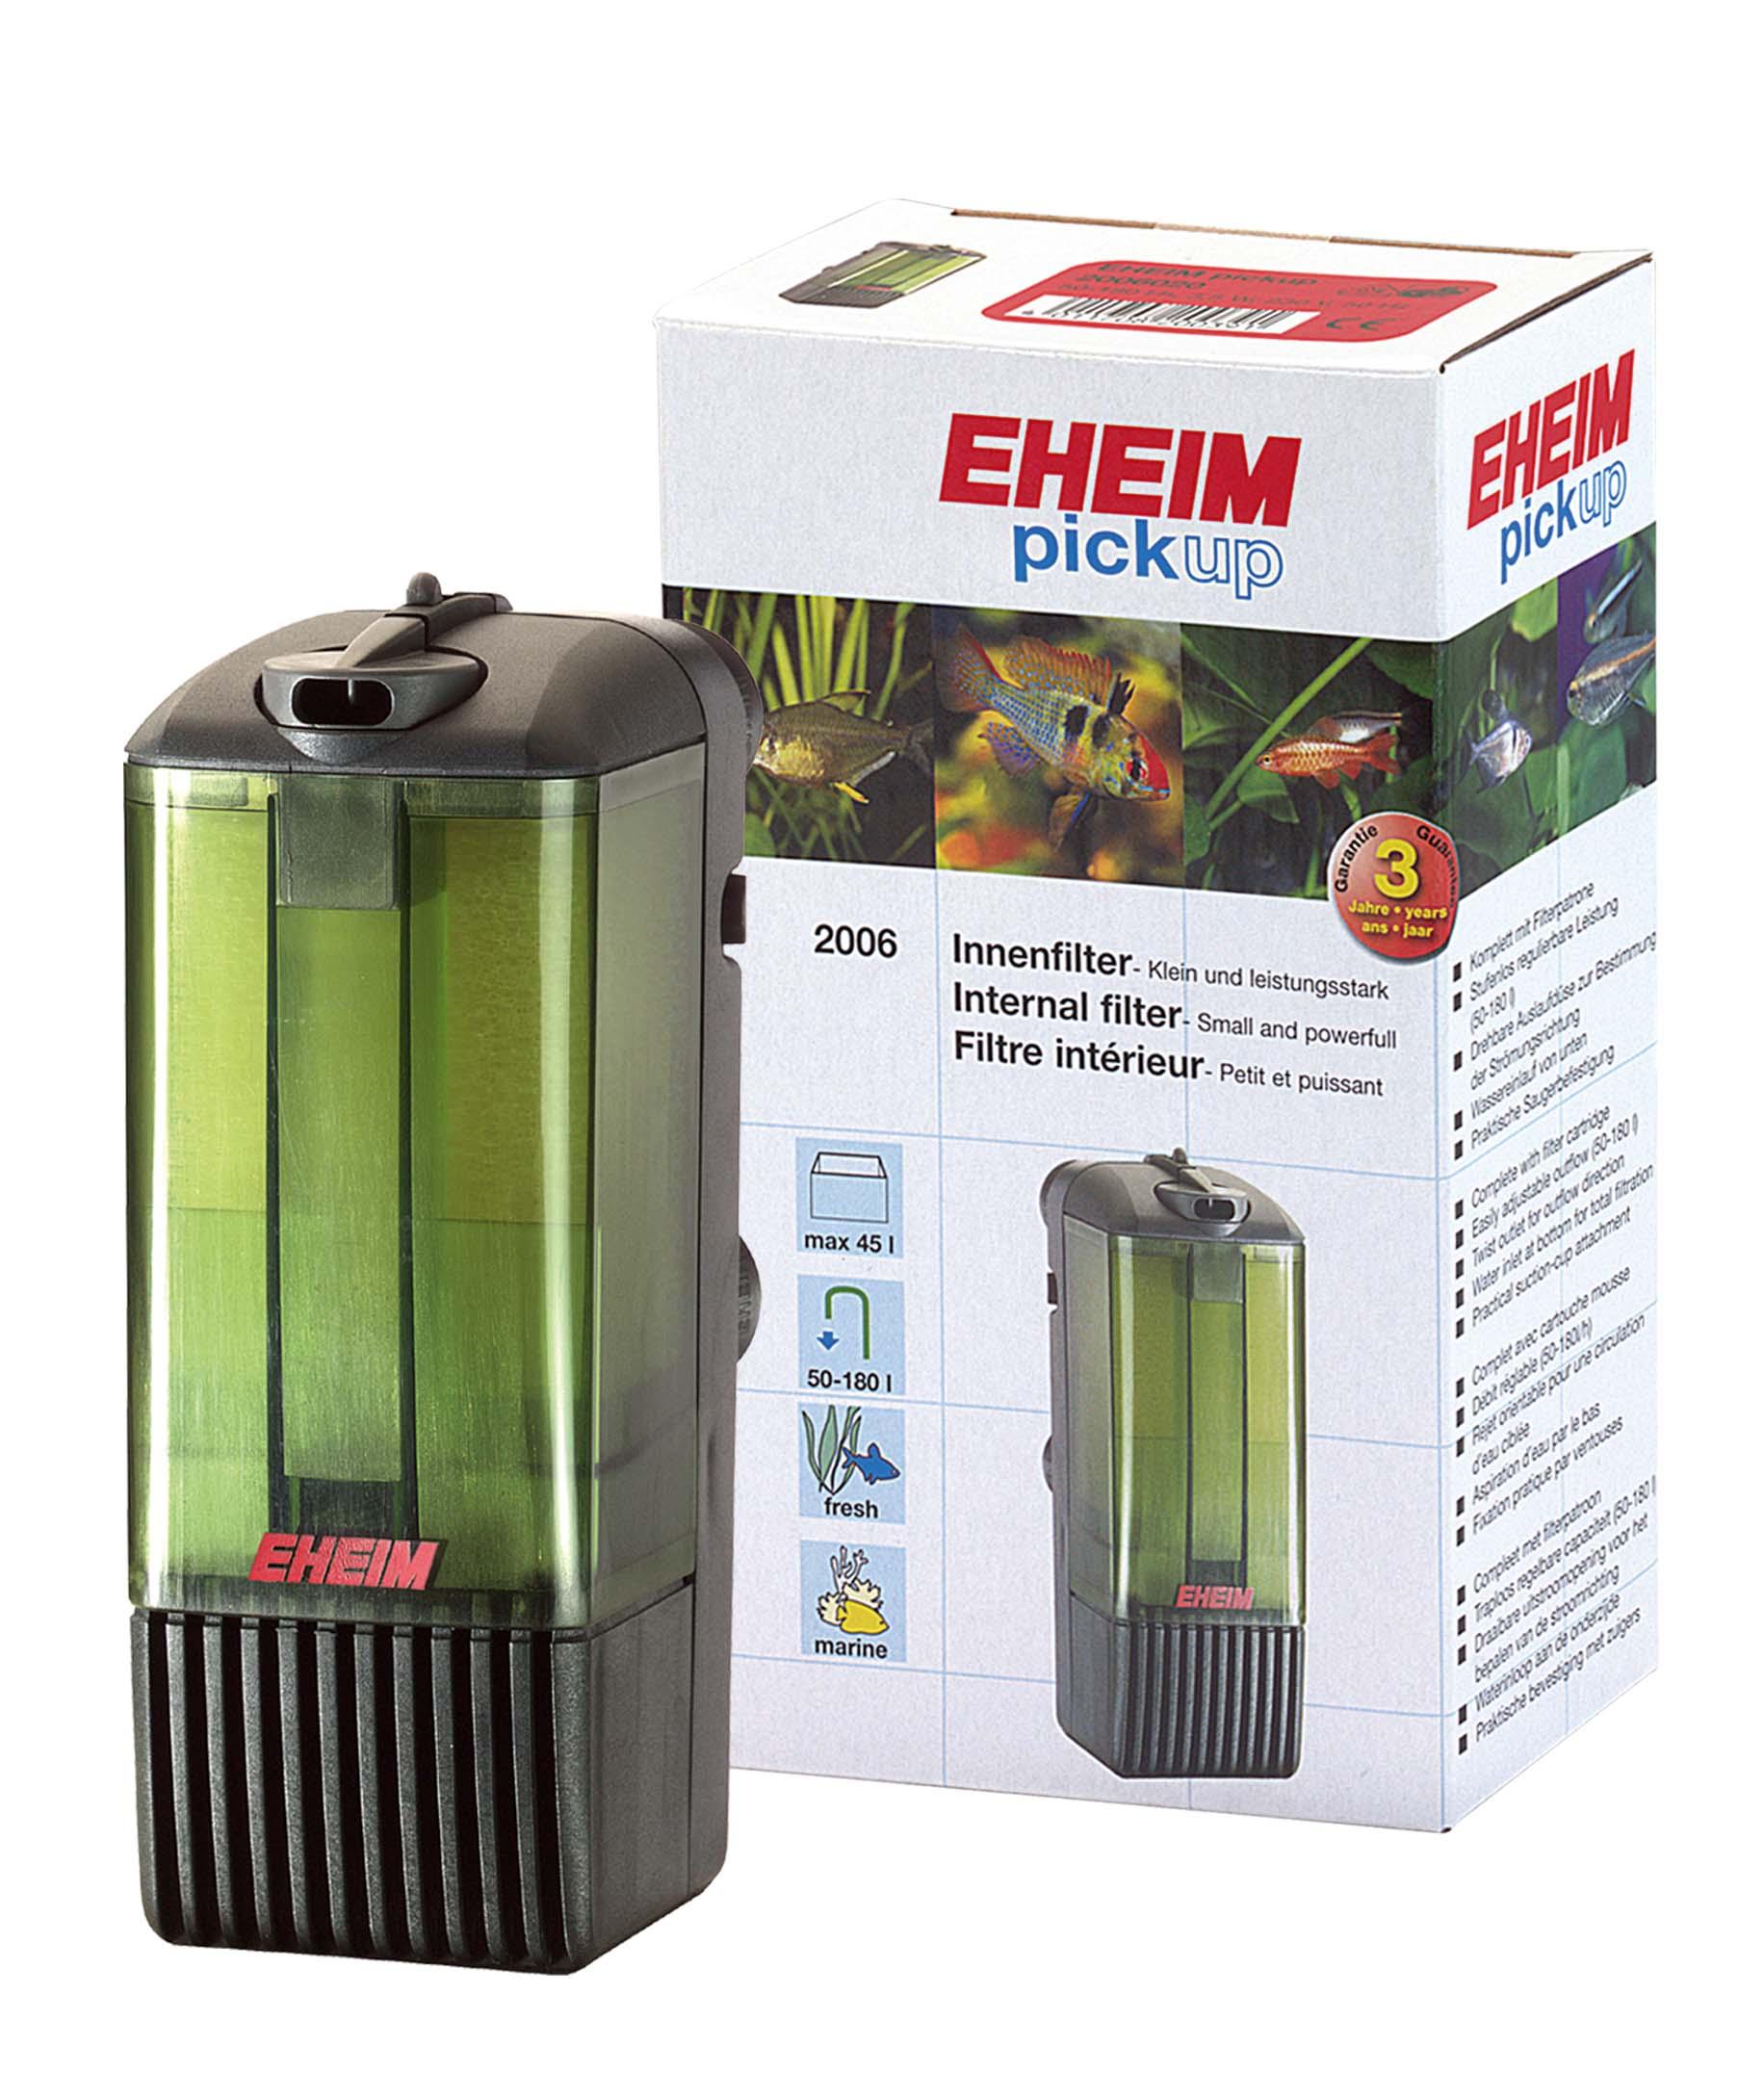 EHEIM GmbH amp; Co. KG EHEIM PICKUP 2006, 45 l